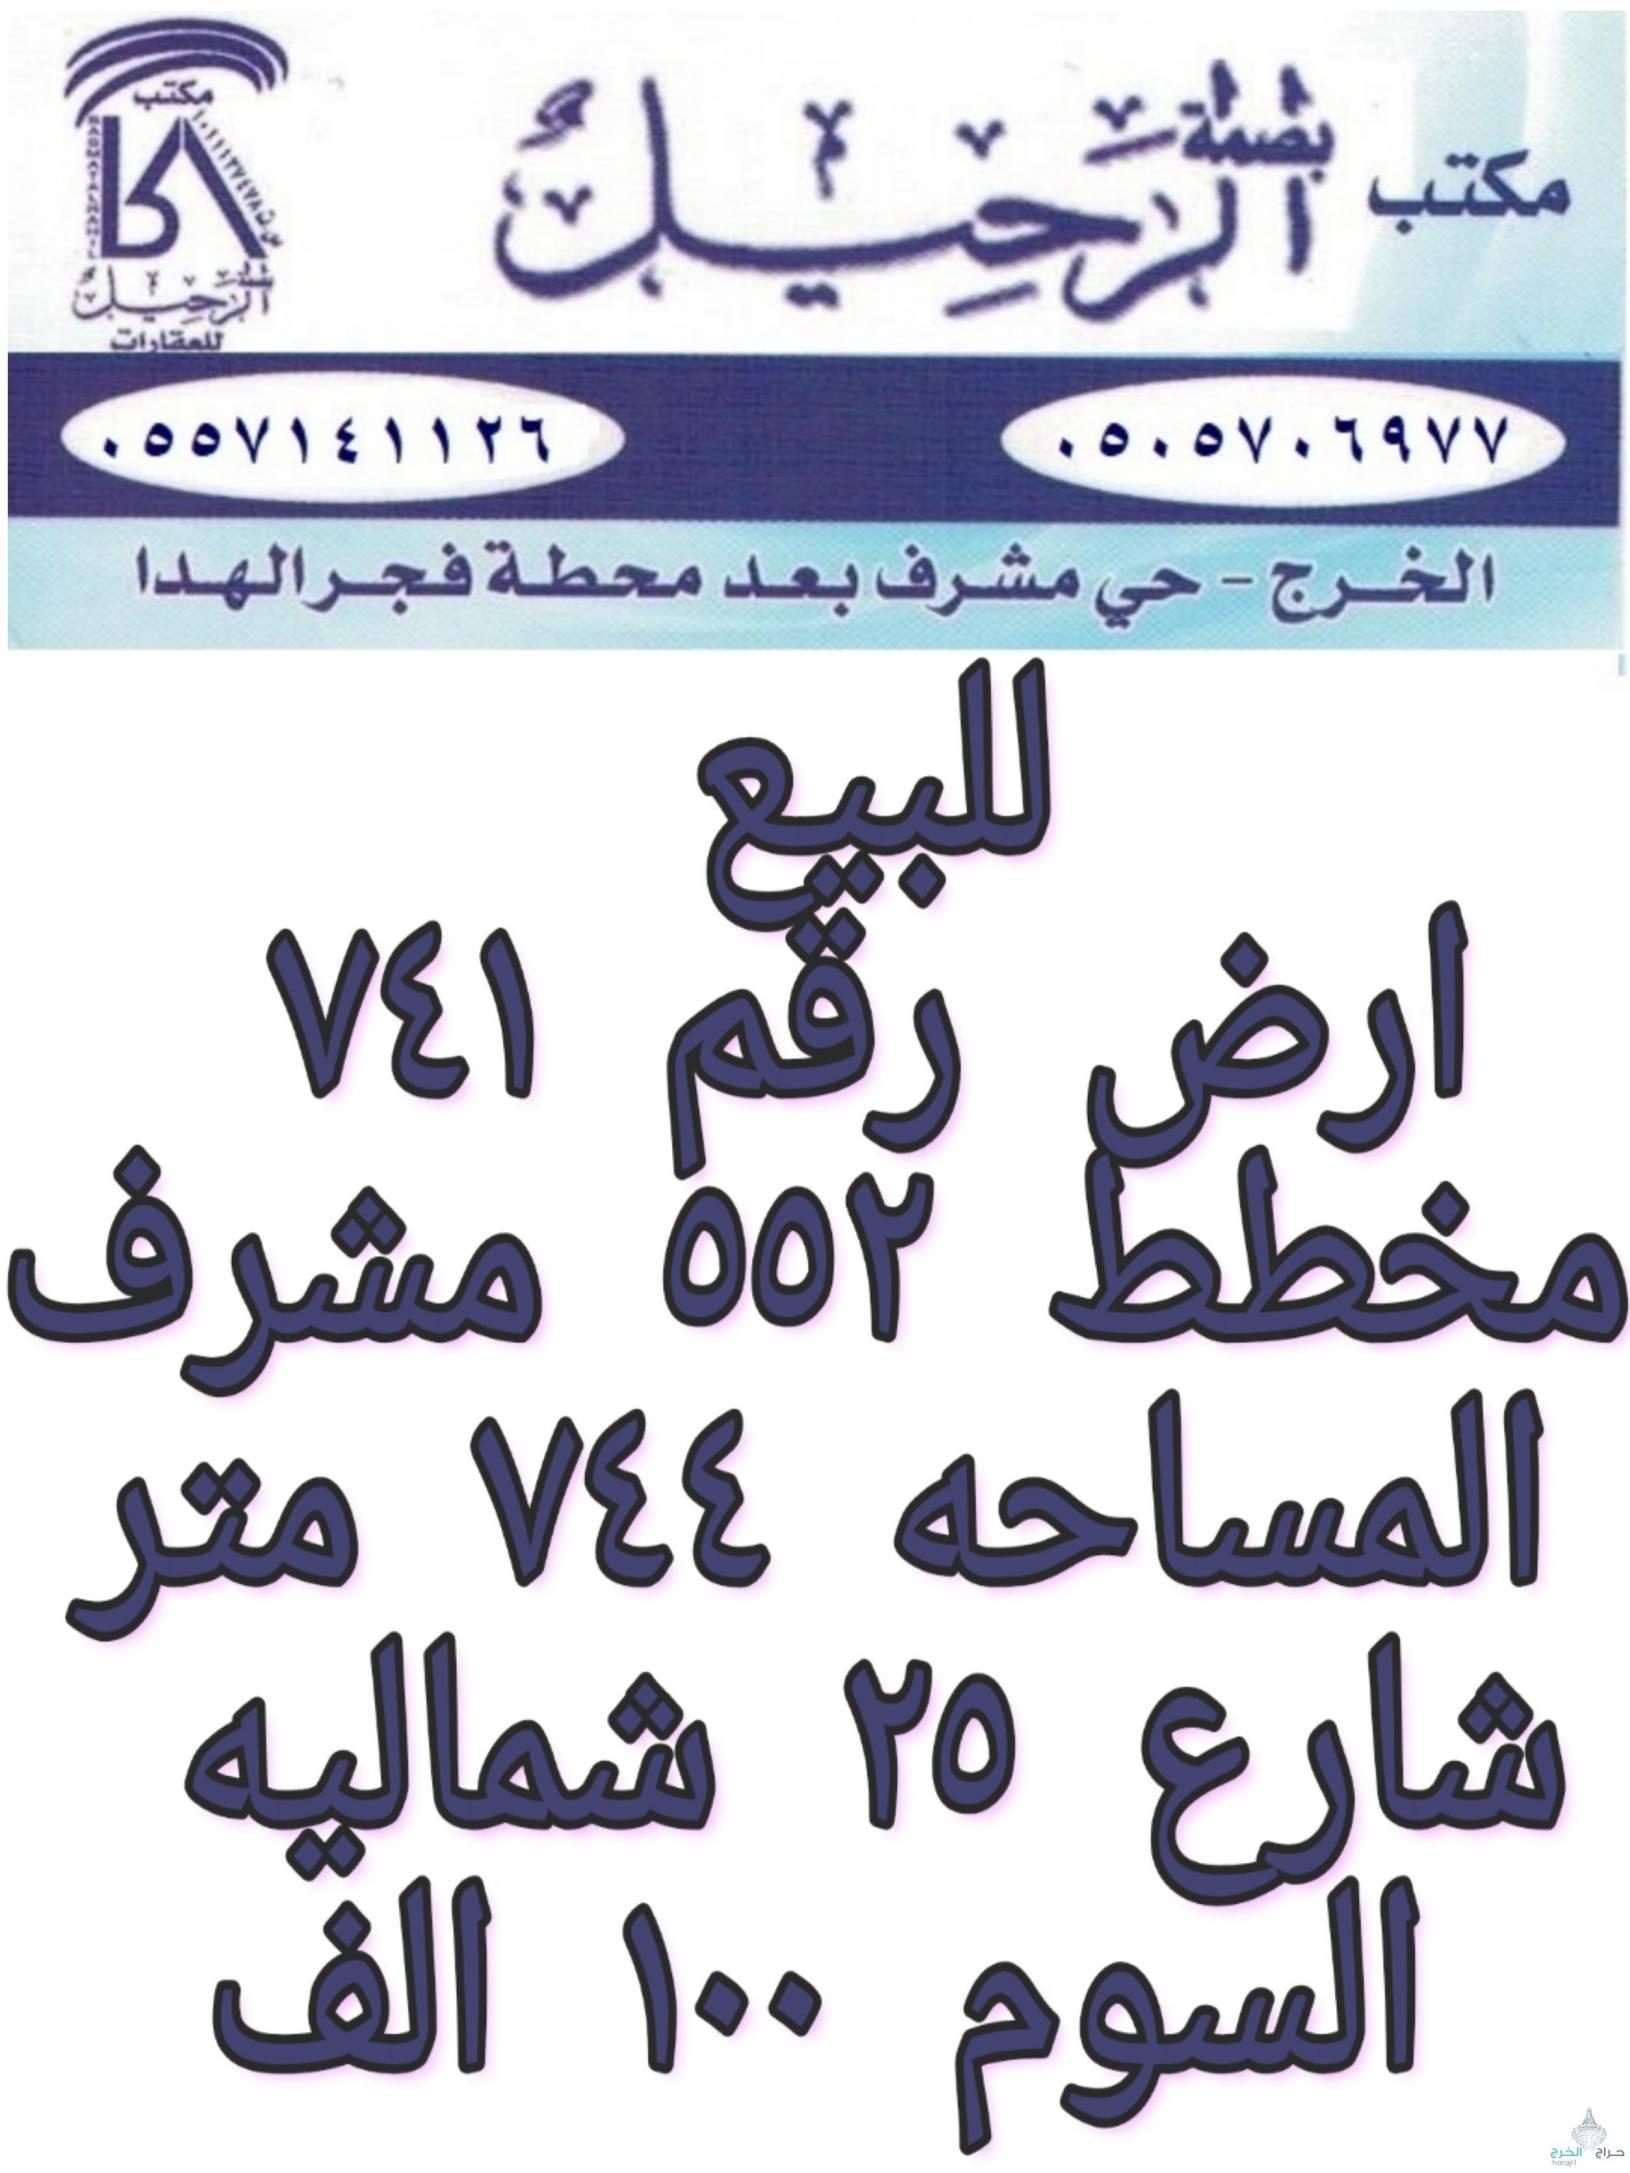 للبيع ارض رقم 741 مخطط 552 حي مشرف